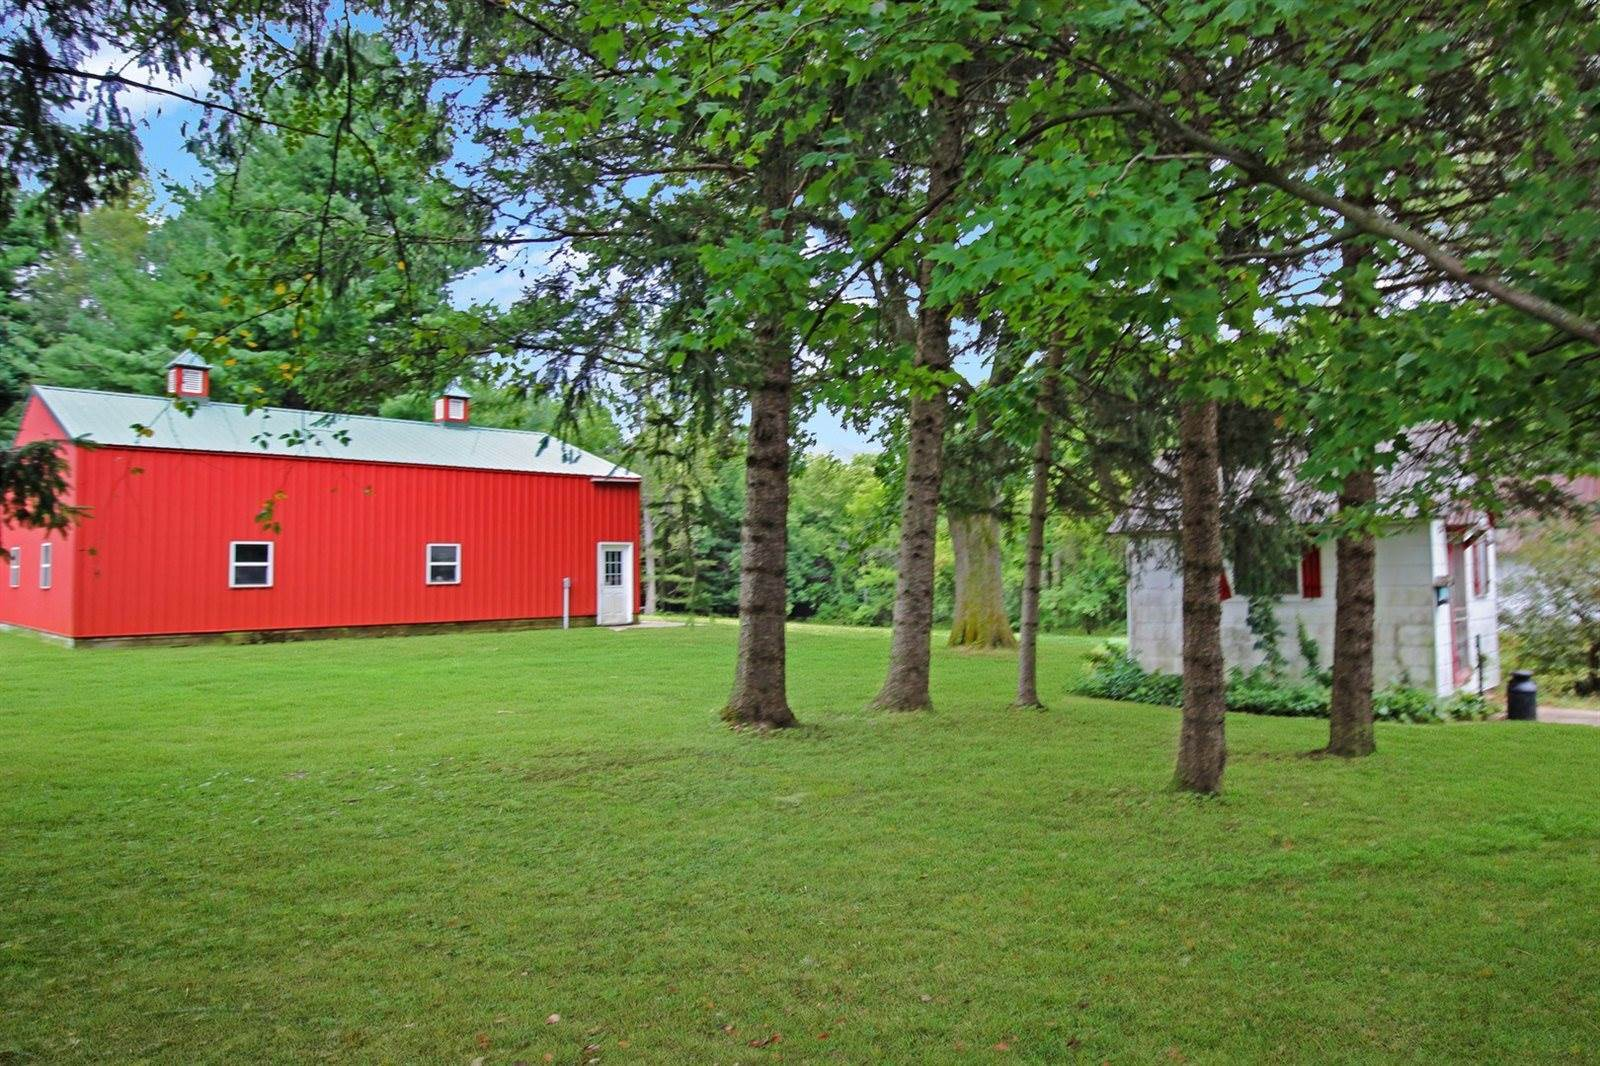 6484 Burr Oak, Freeport, IL 61032